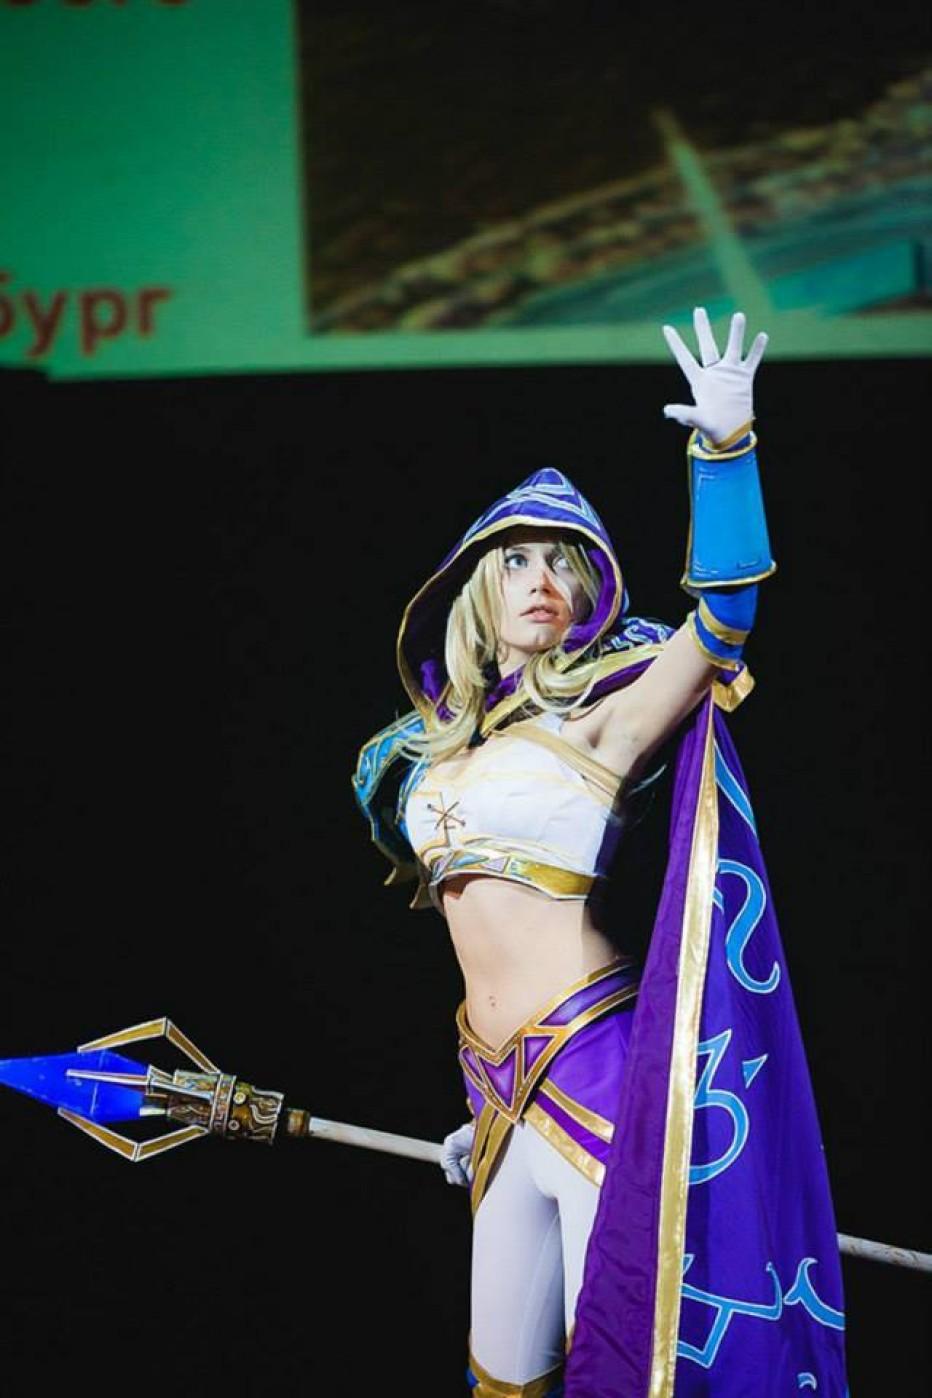 Warcraft-III-Jaina-Proudmoore-Narga-Cosplay-Gamers-Heroes-10.jpg